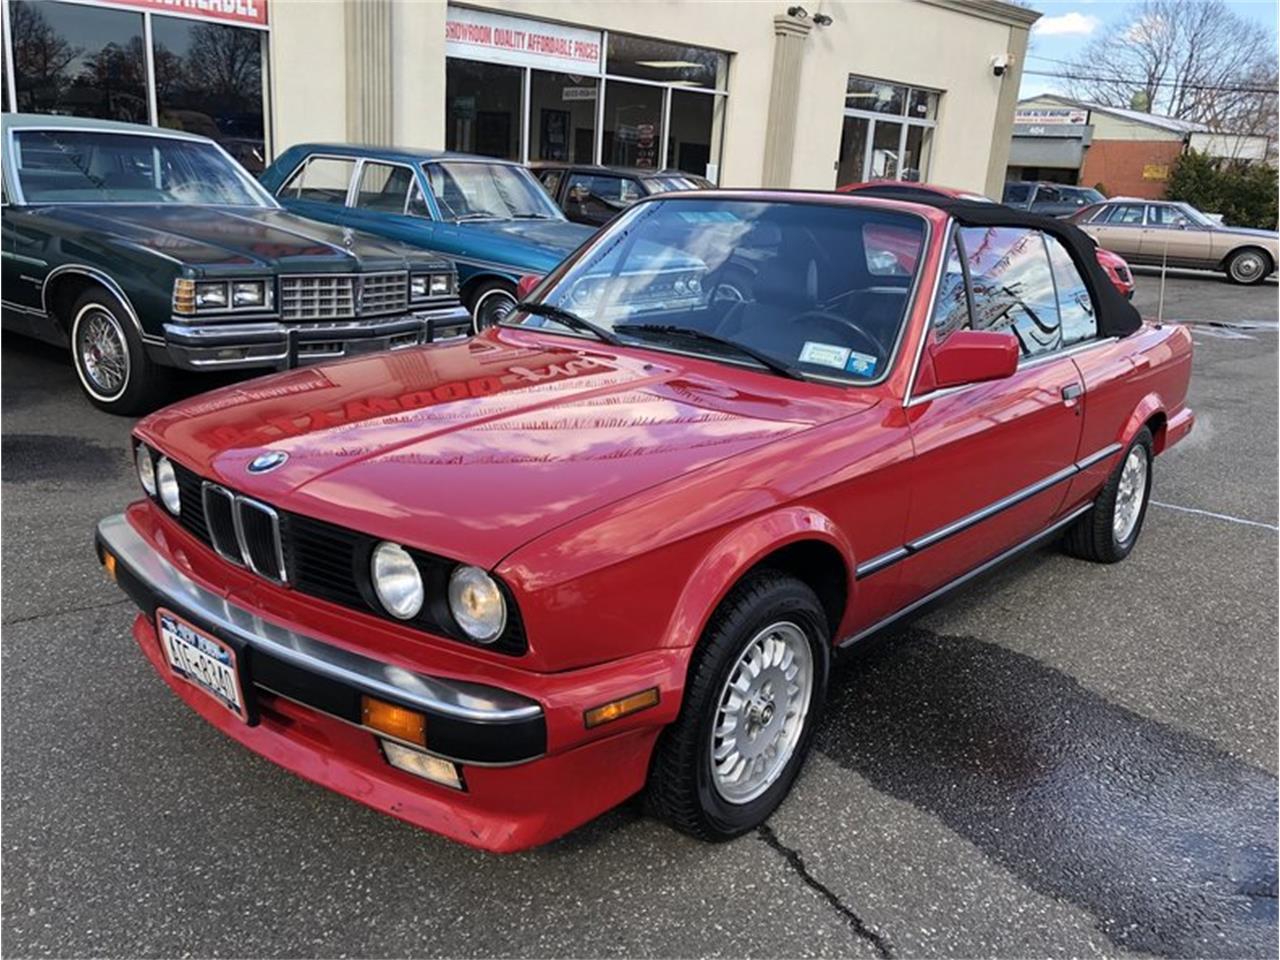 For Sale: 1989 BMW 325i in West Babylon, New York